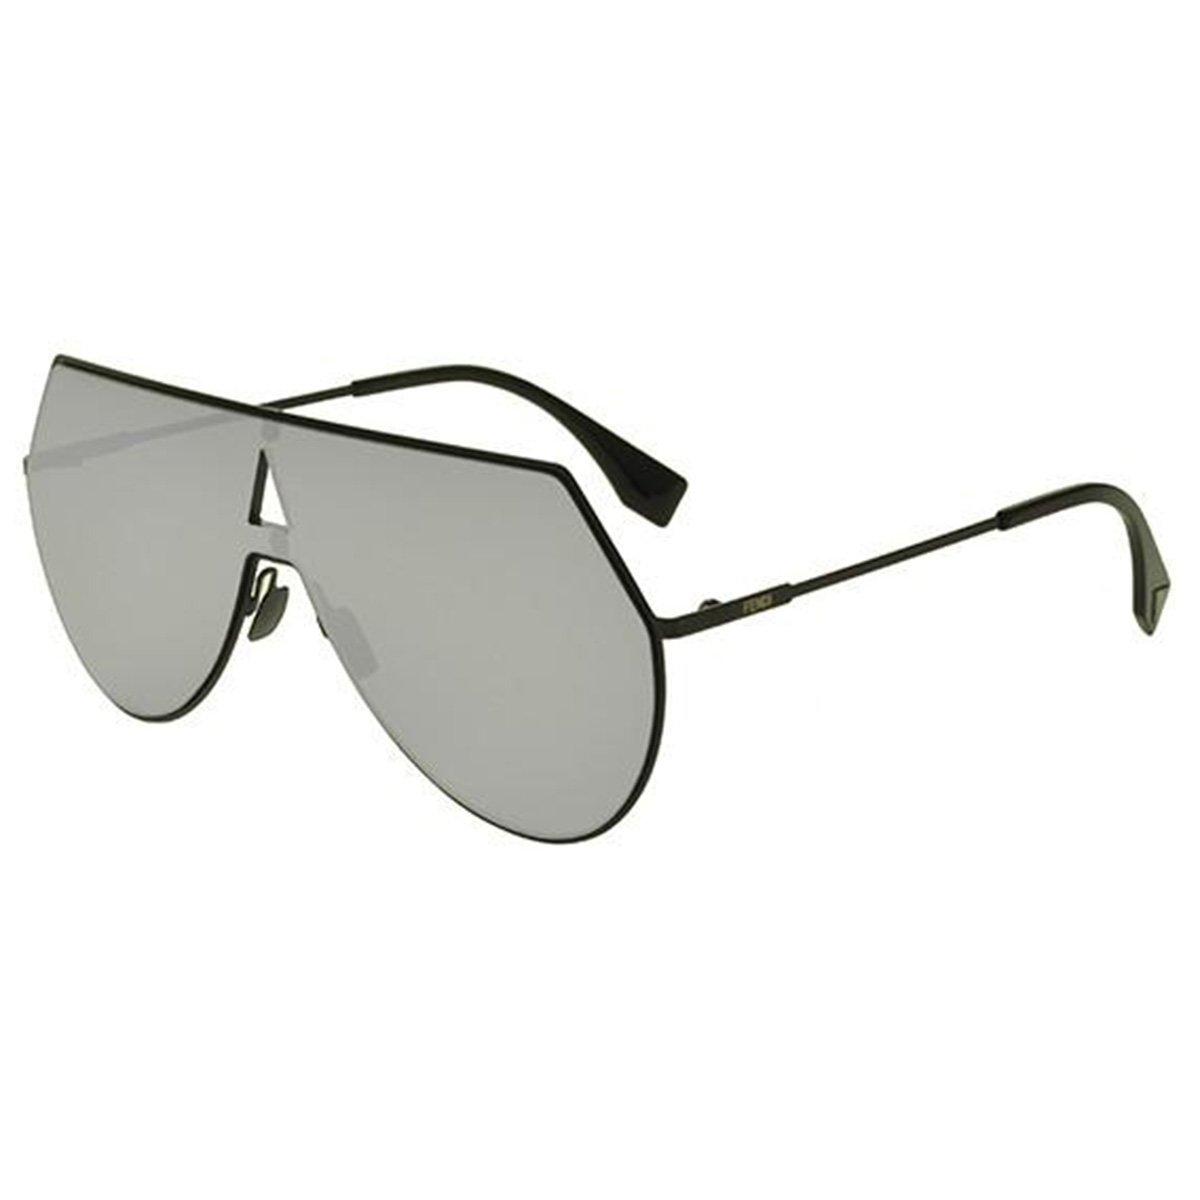 b2138d2bb Compre Óculos de Sol Fendi Eyeline em 10X | Tri-Jóia Shop